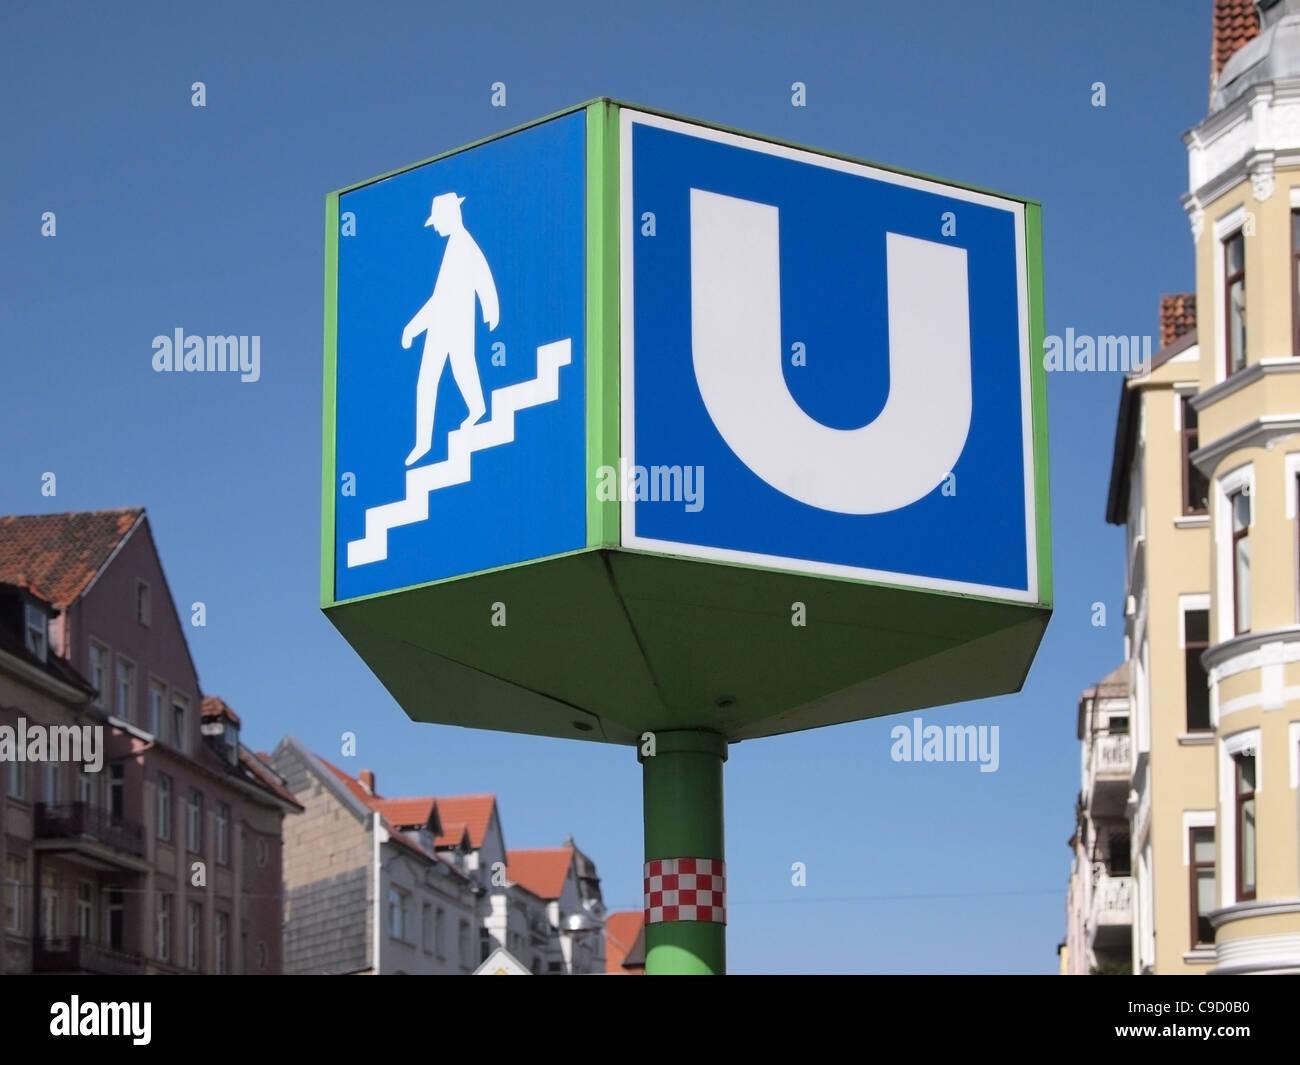 u bahn german underground train sign stock photo royalty free image 40238324 alamy. Black Bedroom Furniture Sets. Home Design Ideas